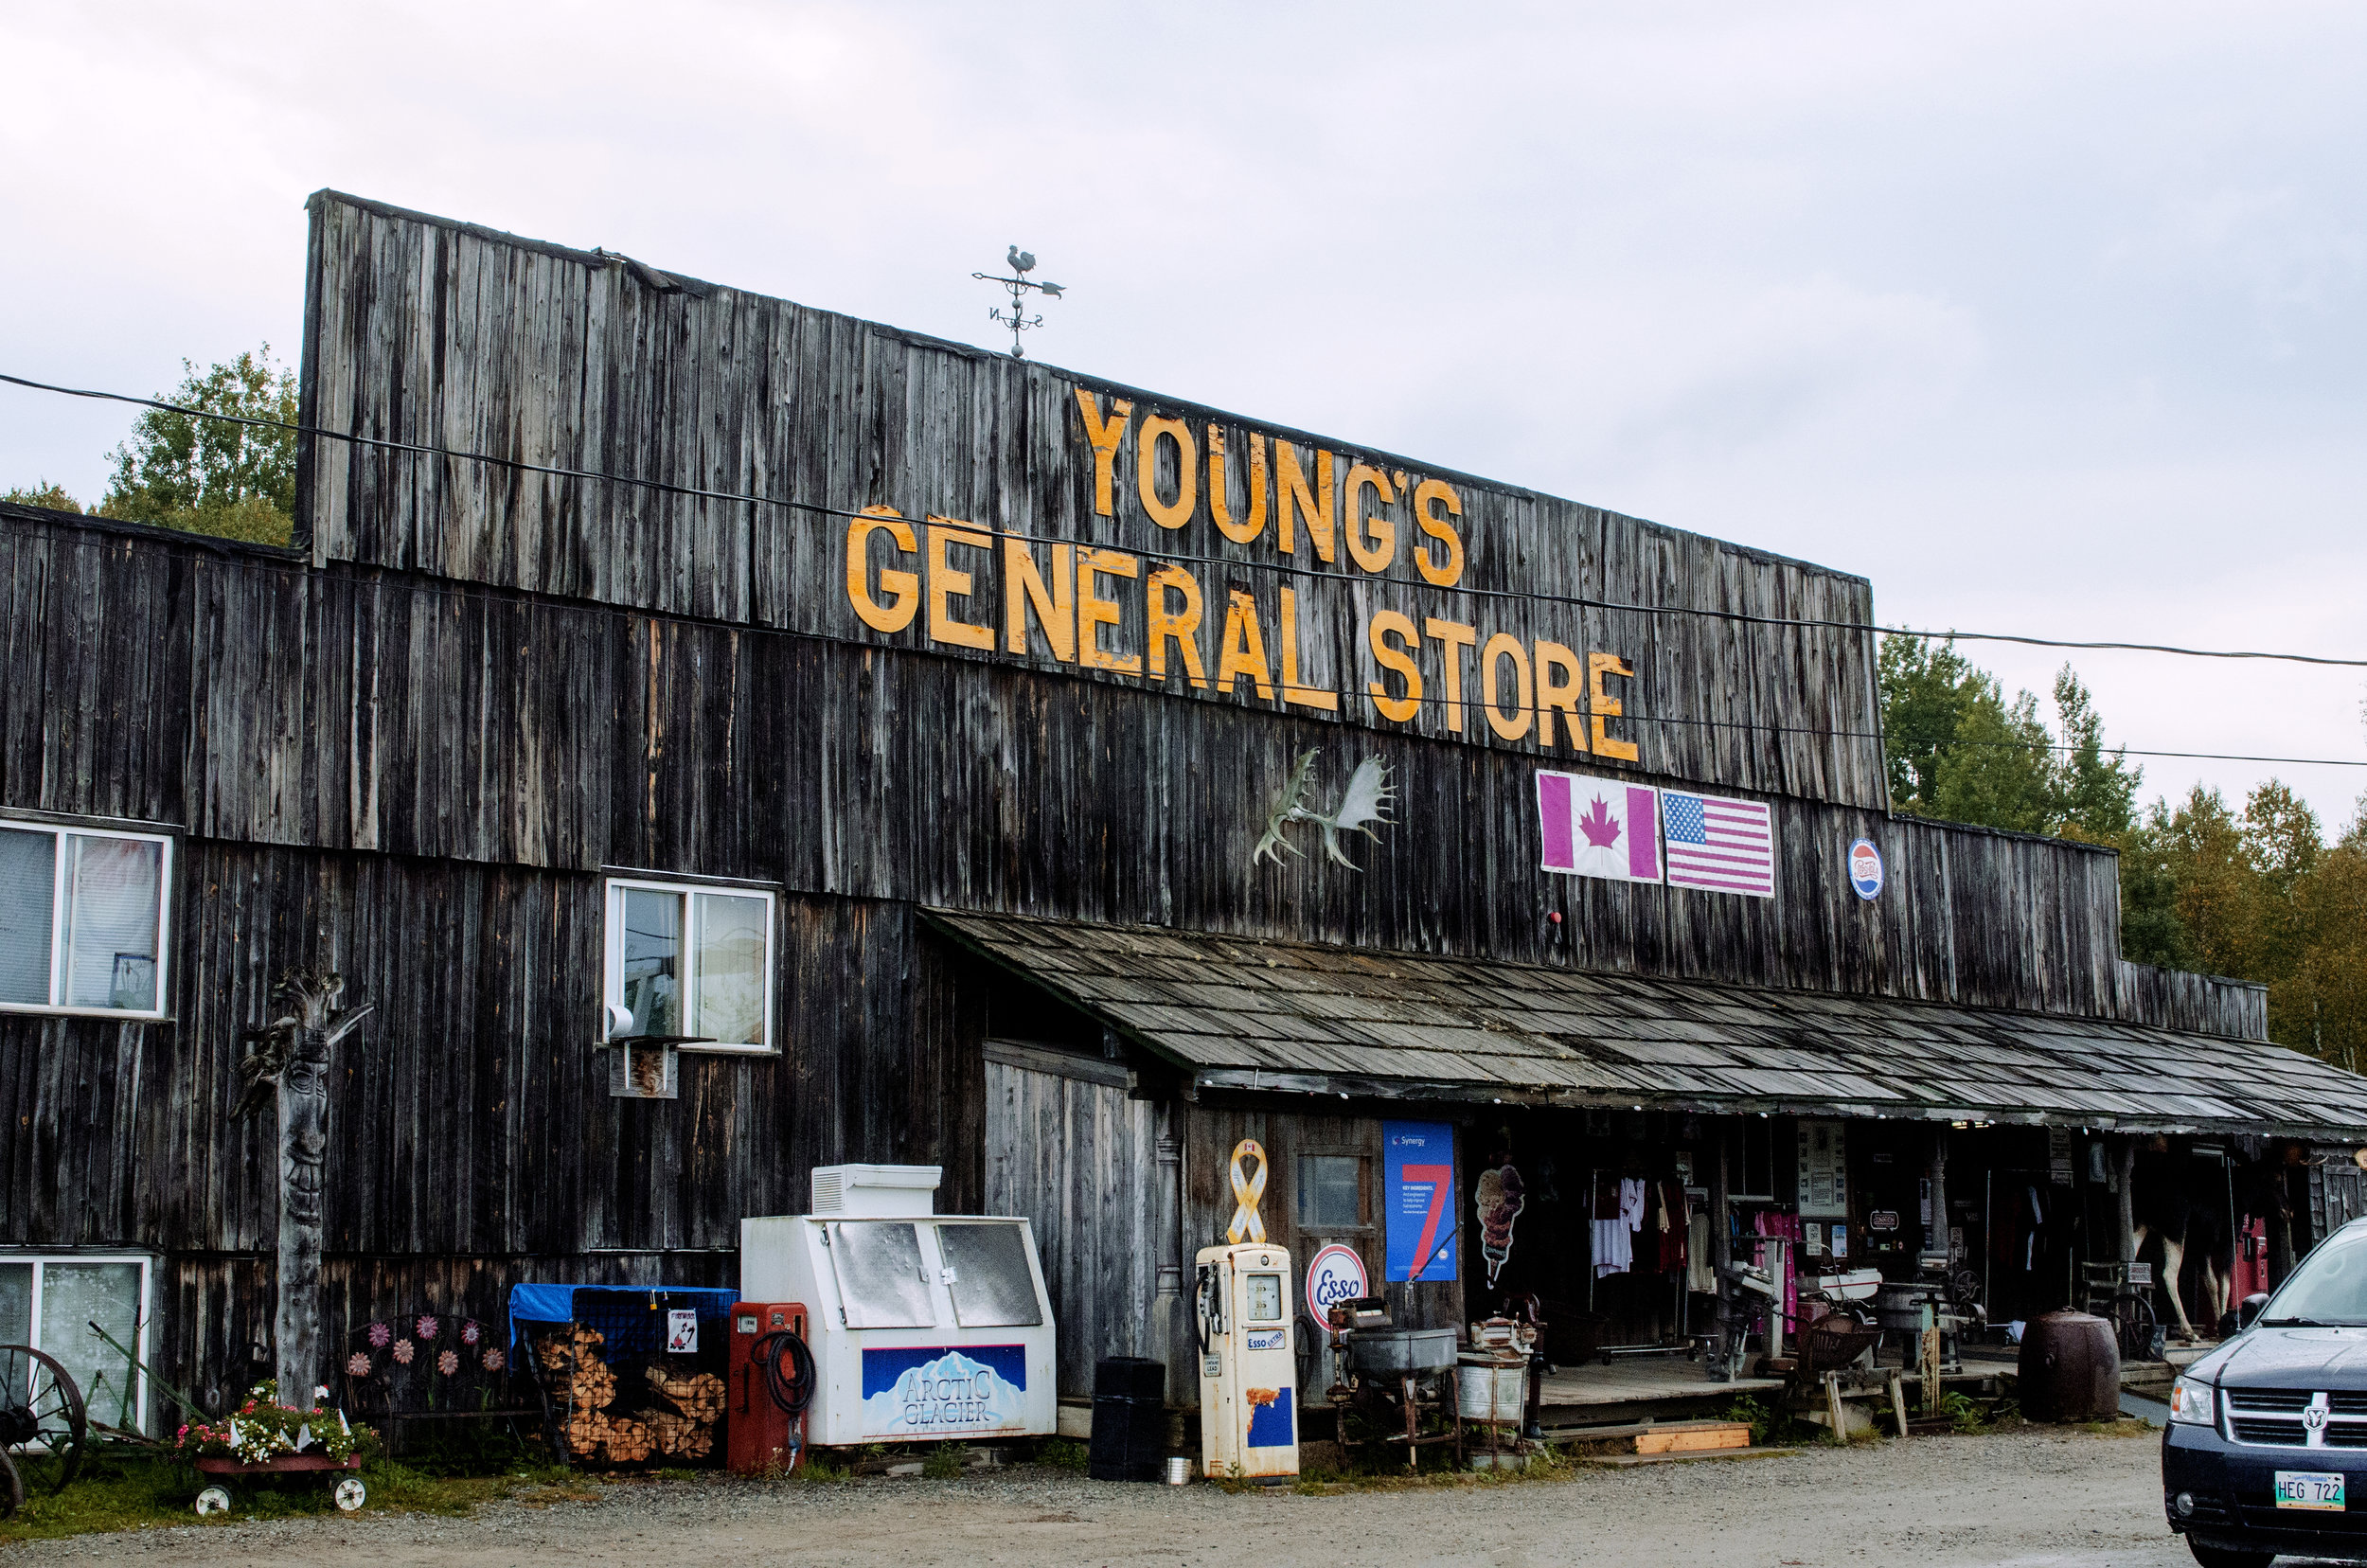 Jenkins, Cheyenne. General Store. 2017. Digital Photography. Wawa, Ontario